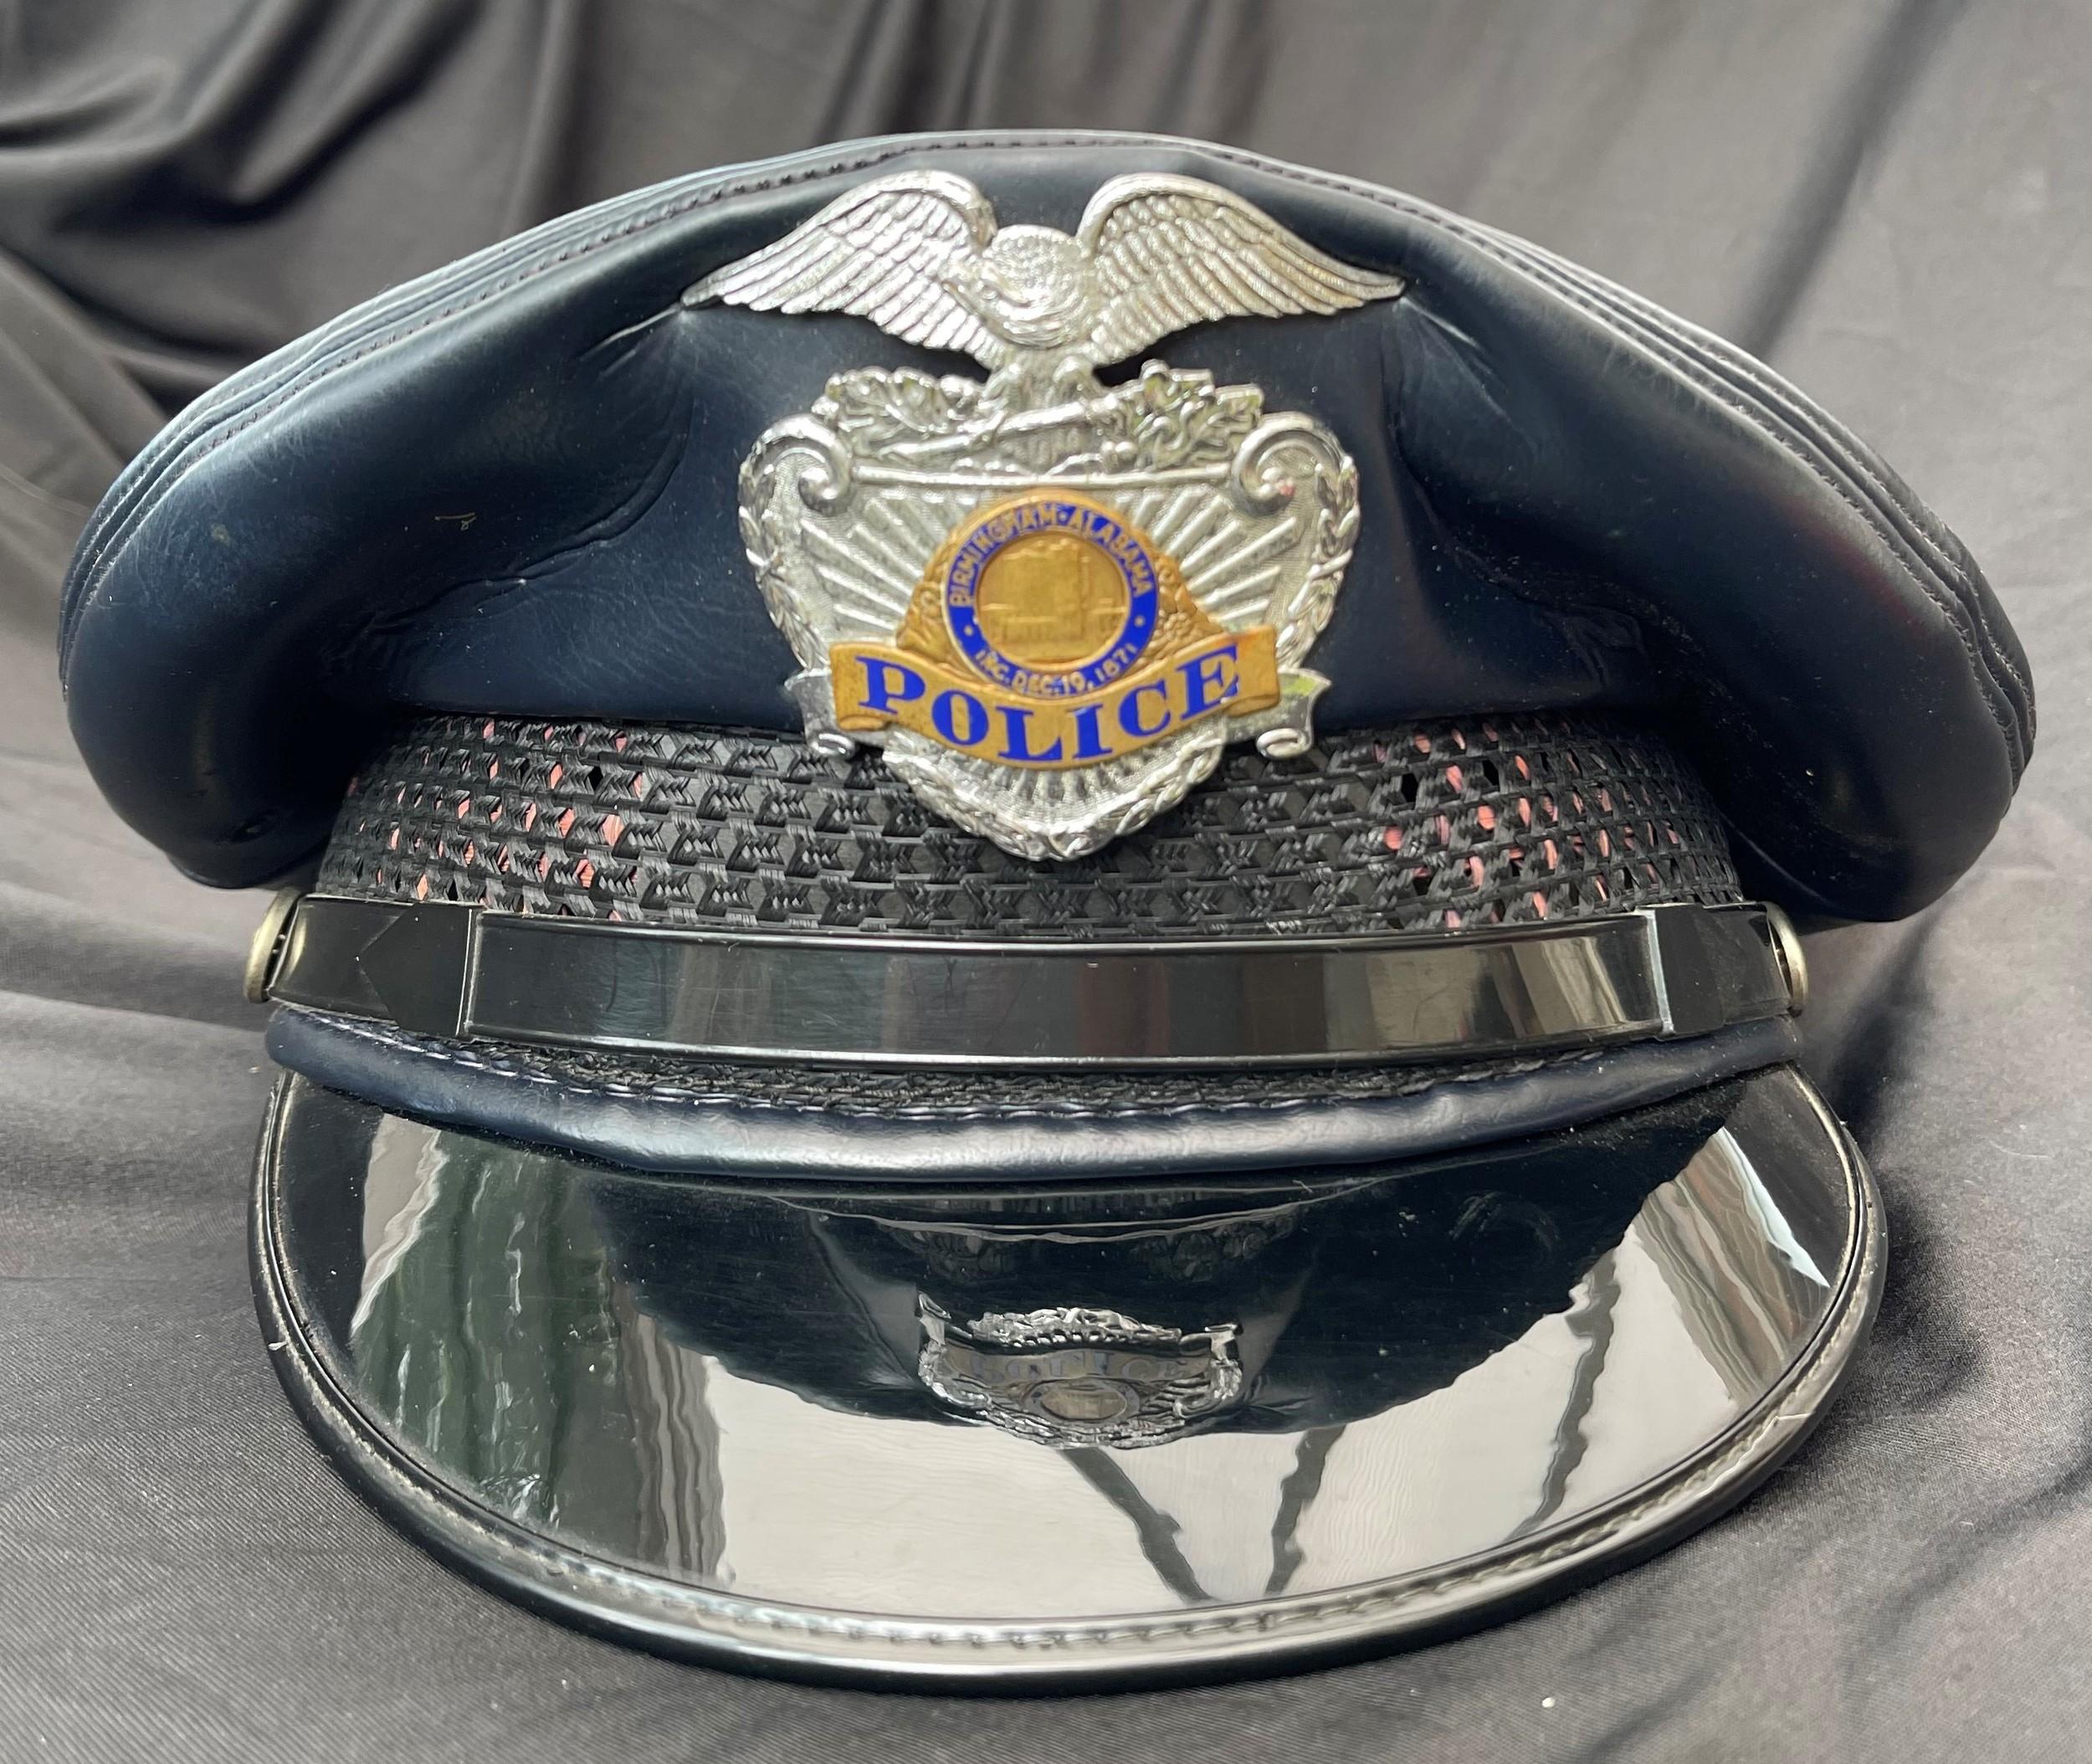 US Birmingham Alabama Police Department Officers Cap. Complete with enamel cap badge. Plastic